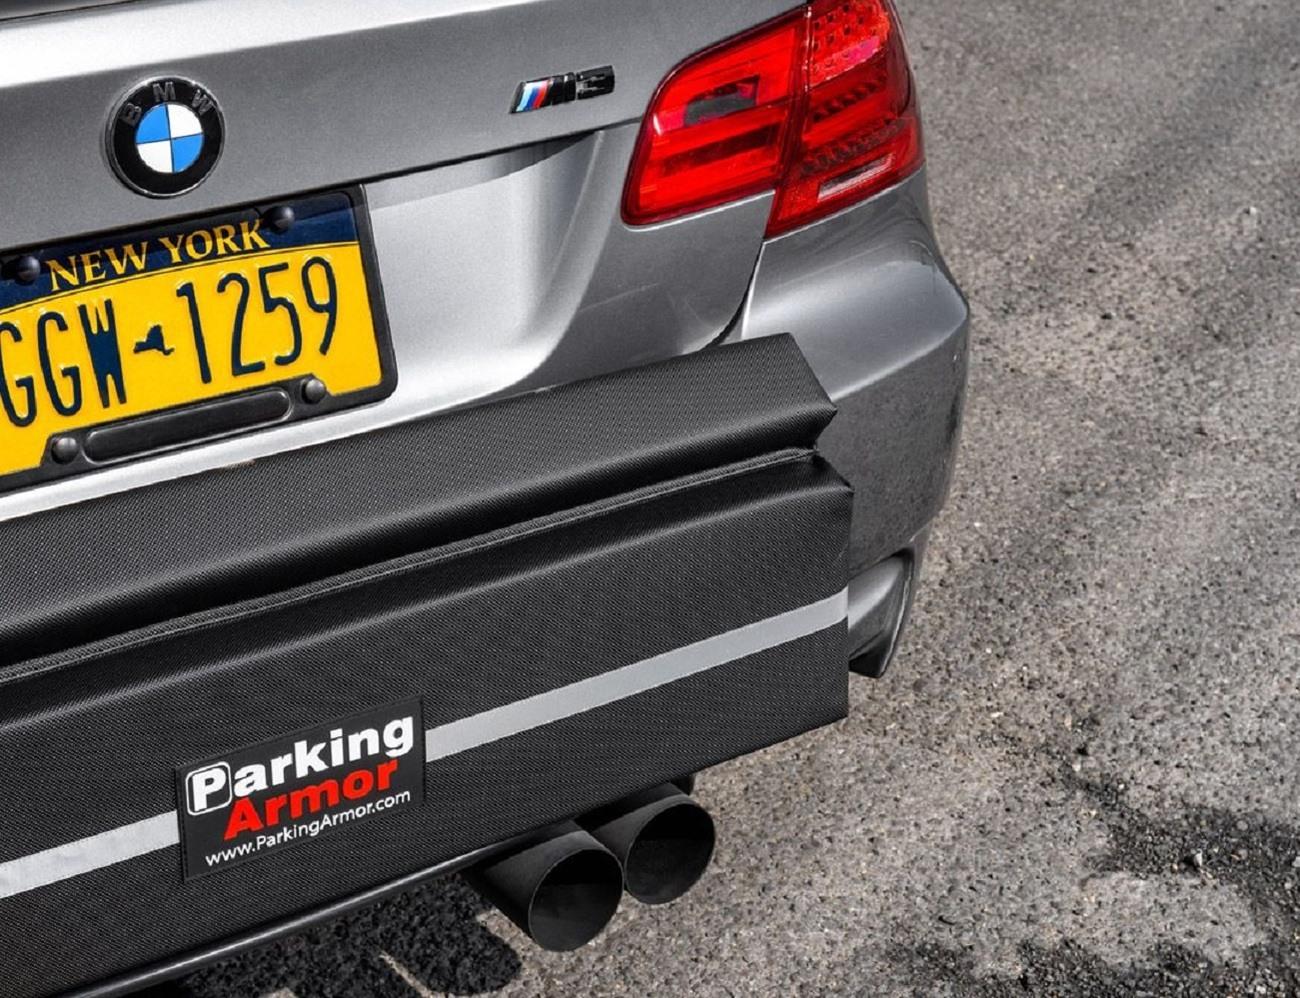 Parking Armor